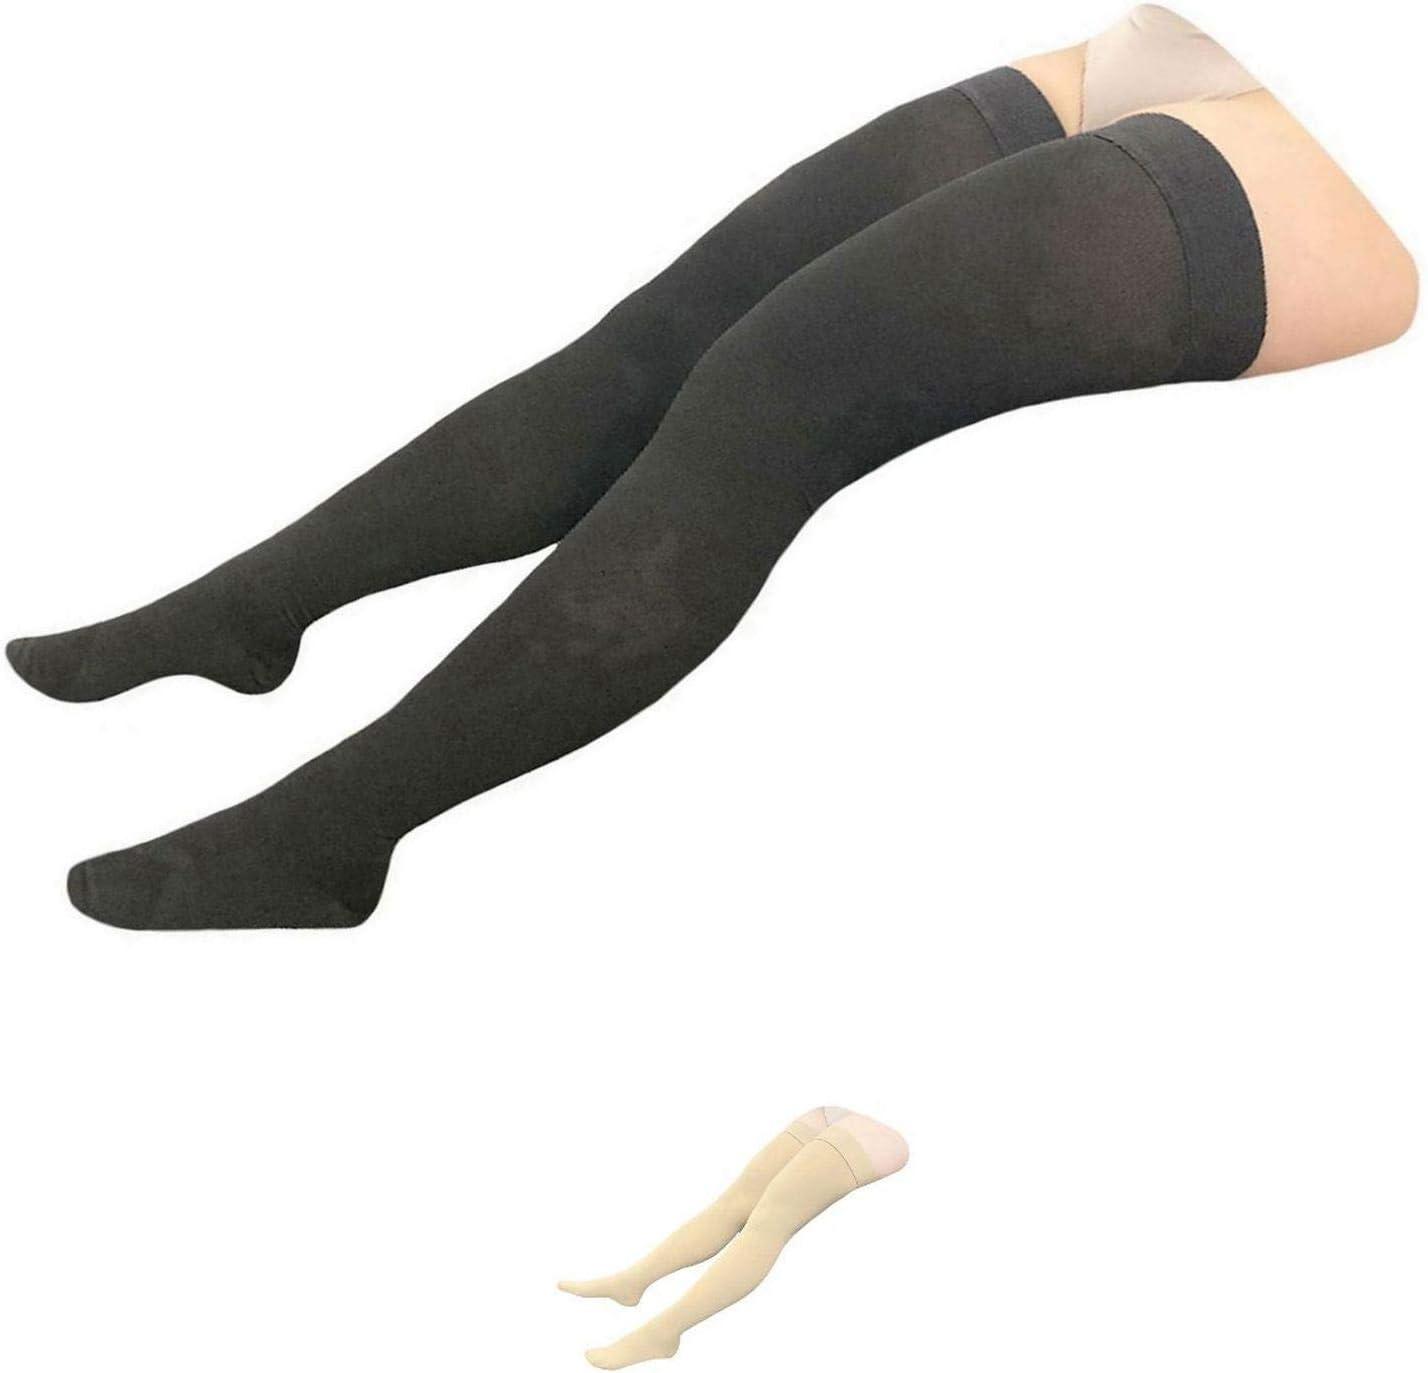 HealthyNees Thigh Closed Toe 開店記念セール 20-30 Pl Compression mmHg Wide 買収 Calf